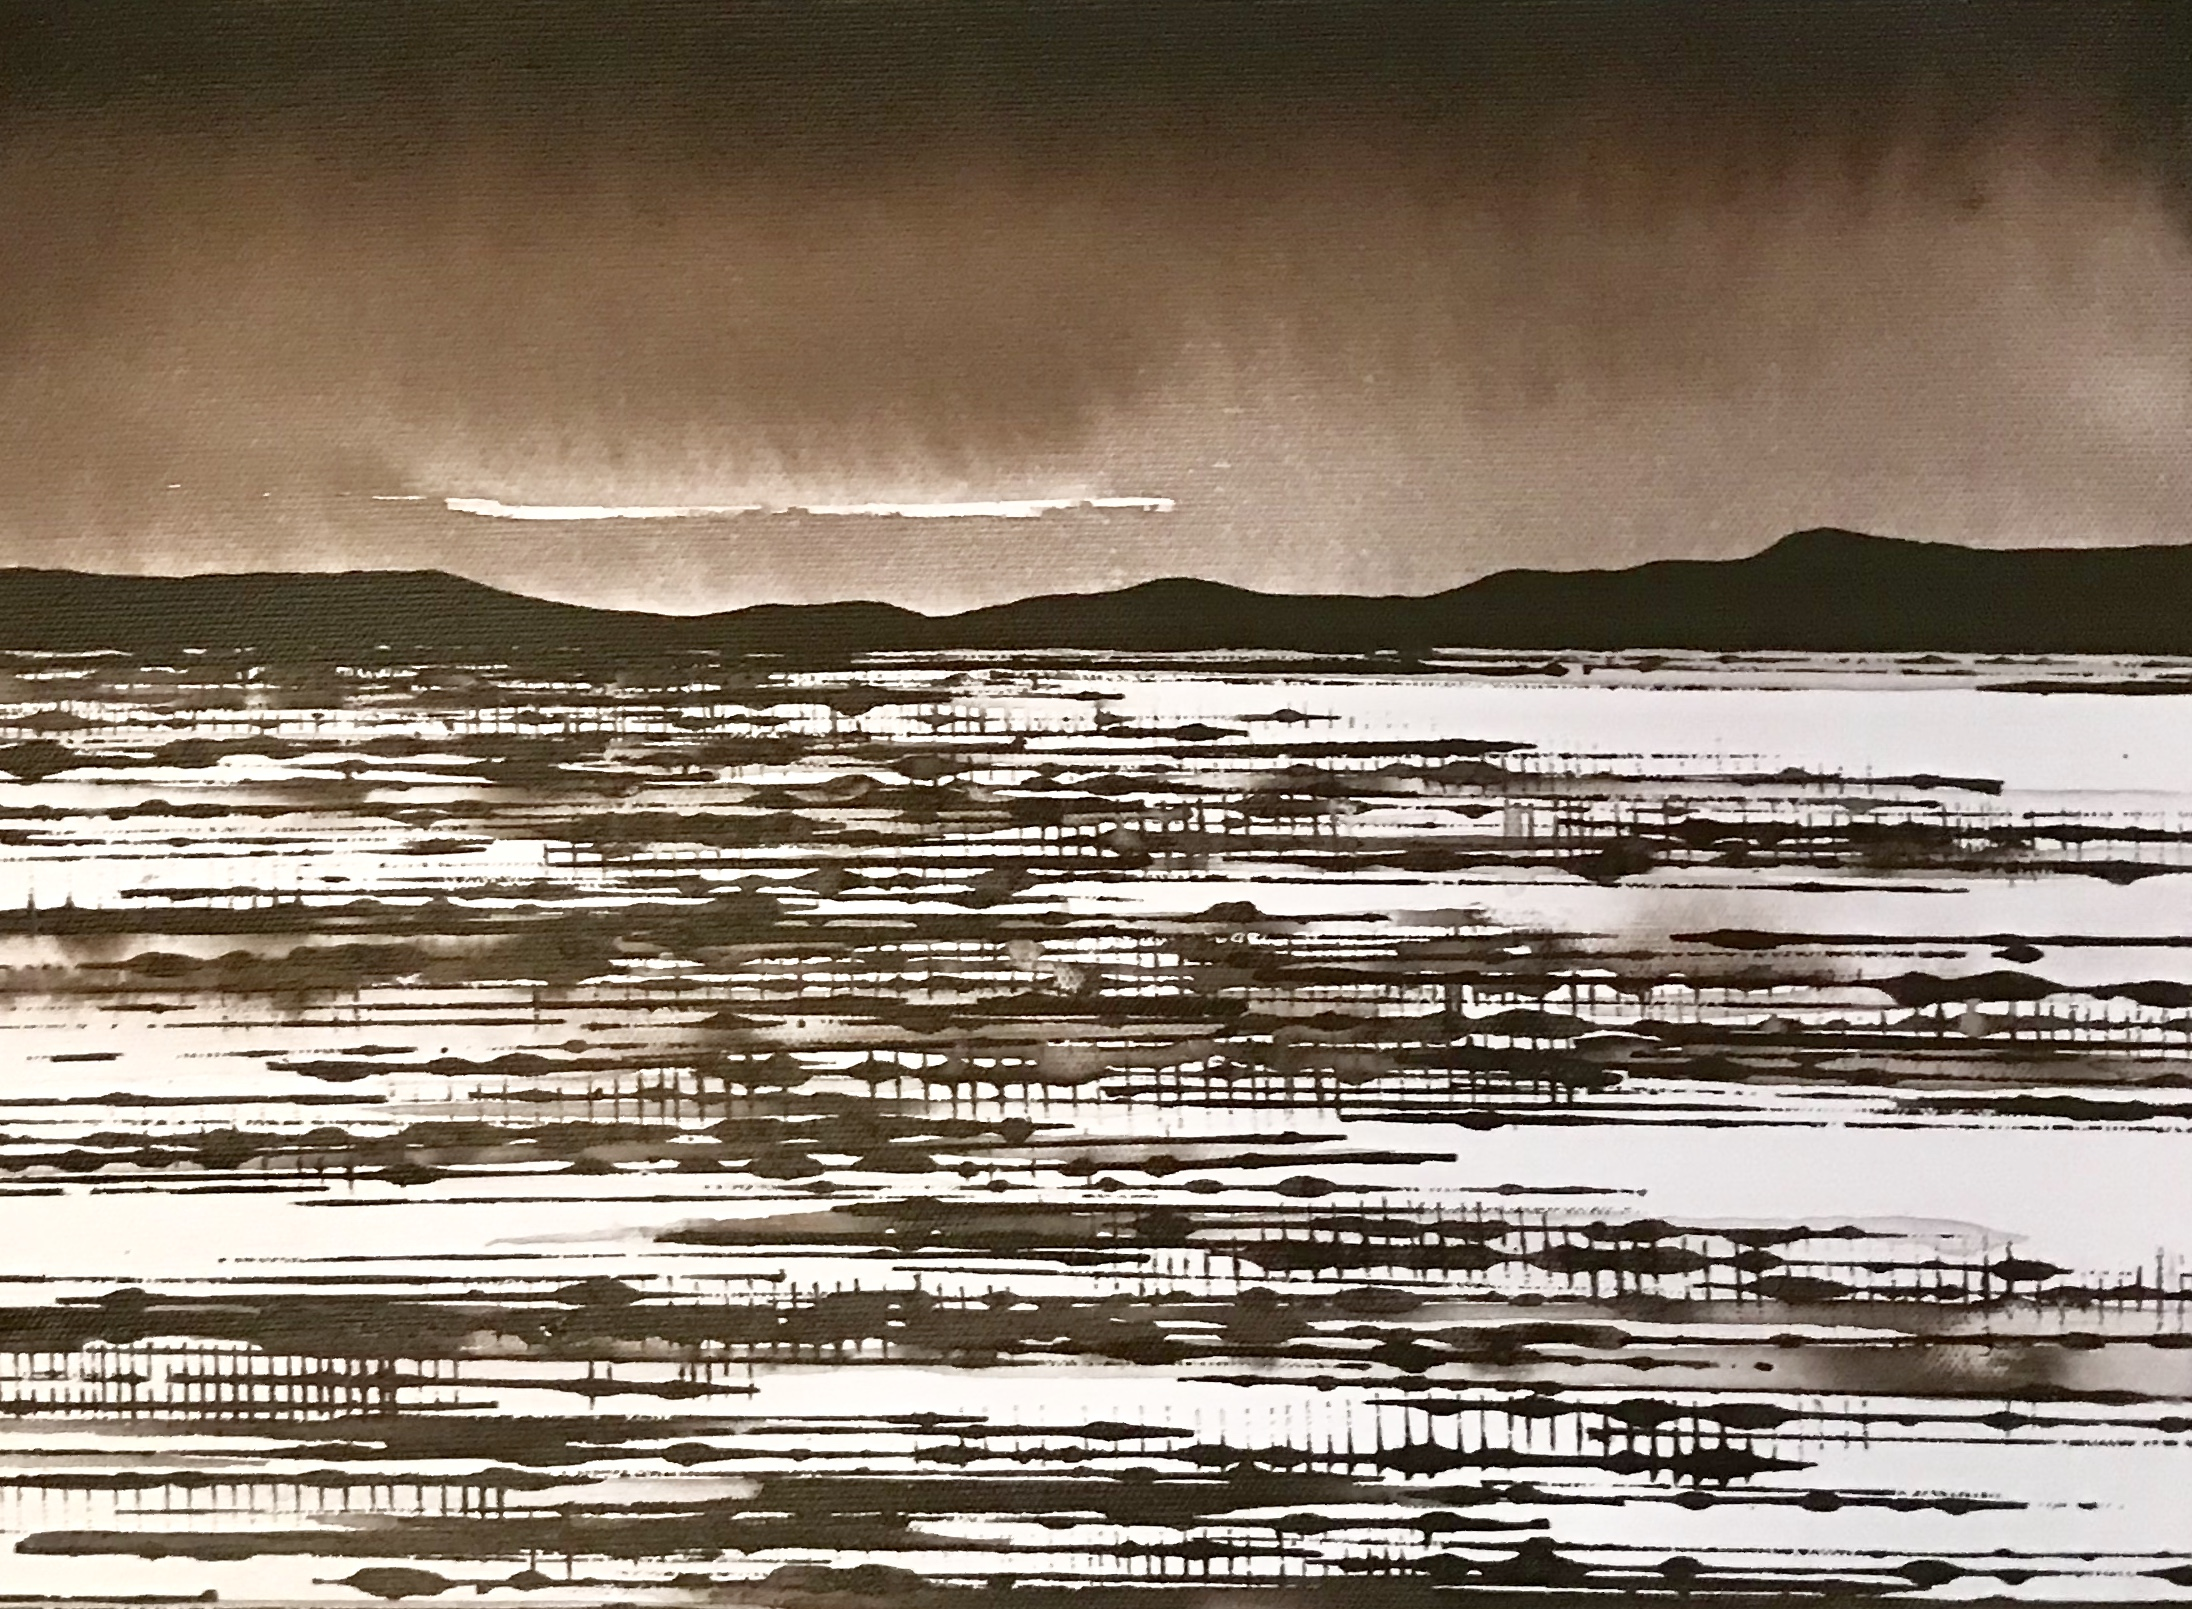 David Middlebrook Desert Field and Cloud